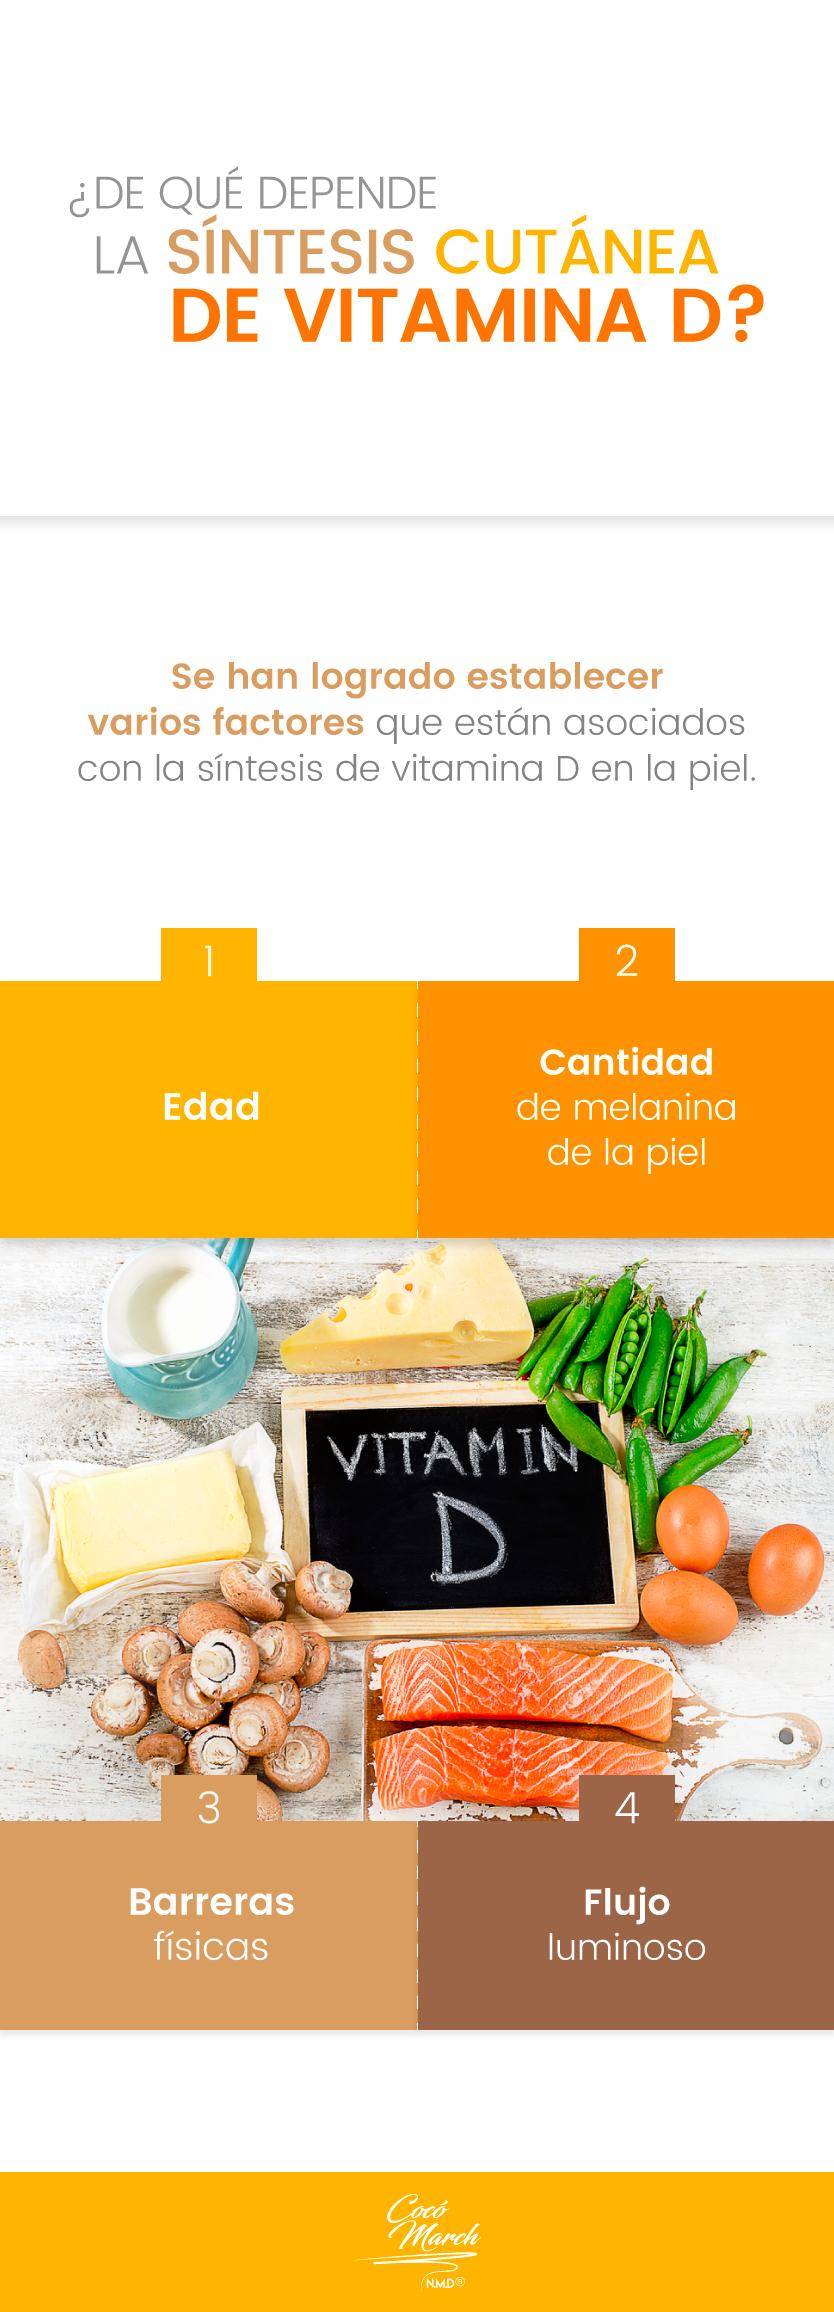 sintesis-cutanea-de-la-vitamina-d